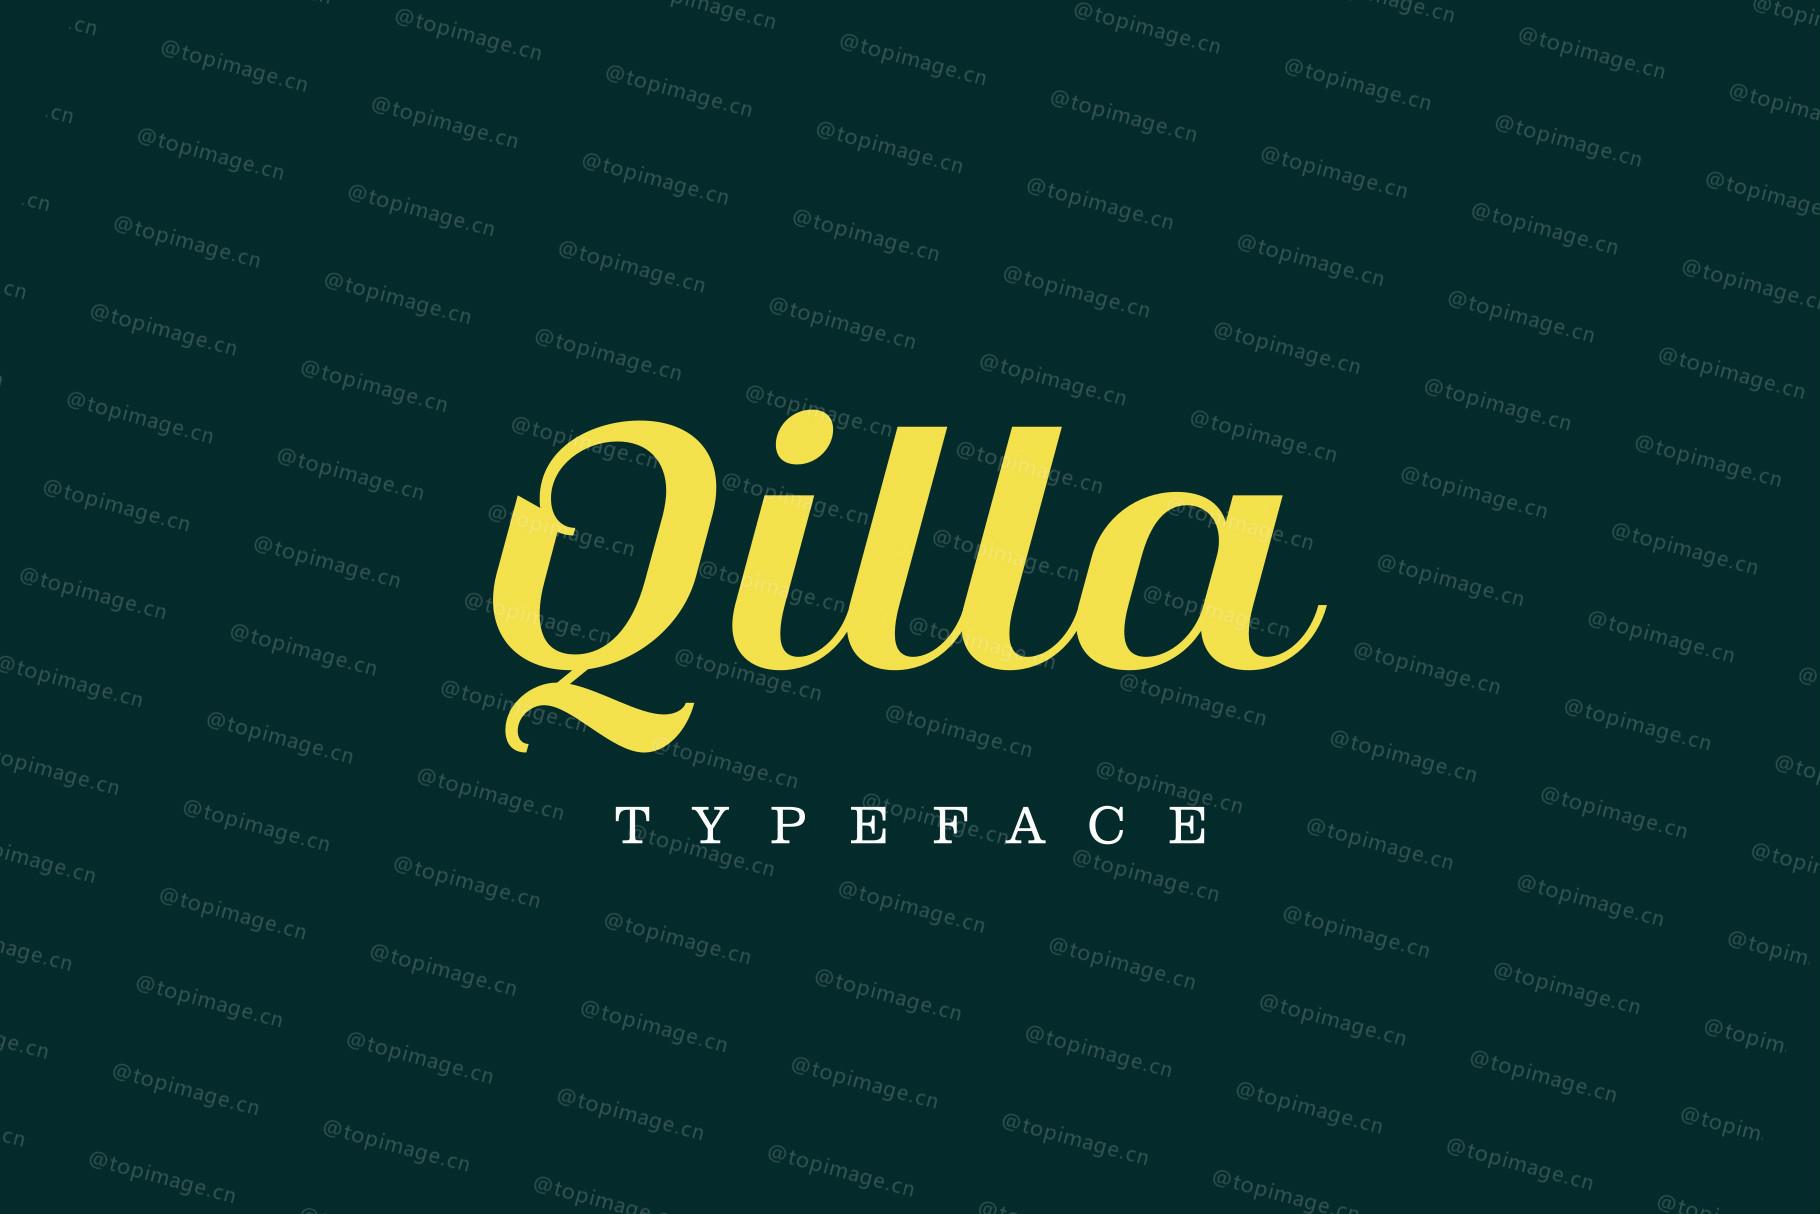 Qilla Slant时尚传统logo好看的英文字体下载